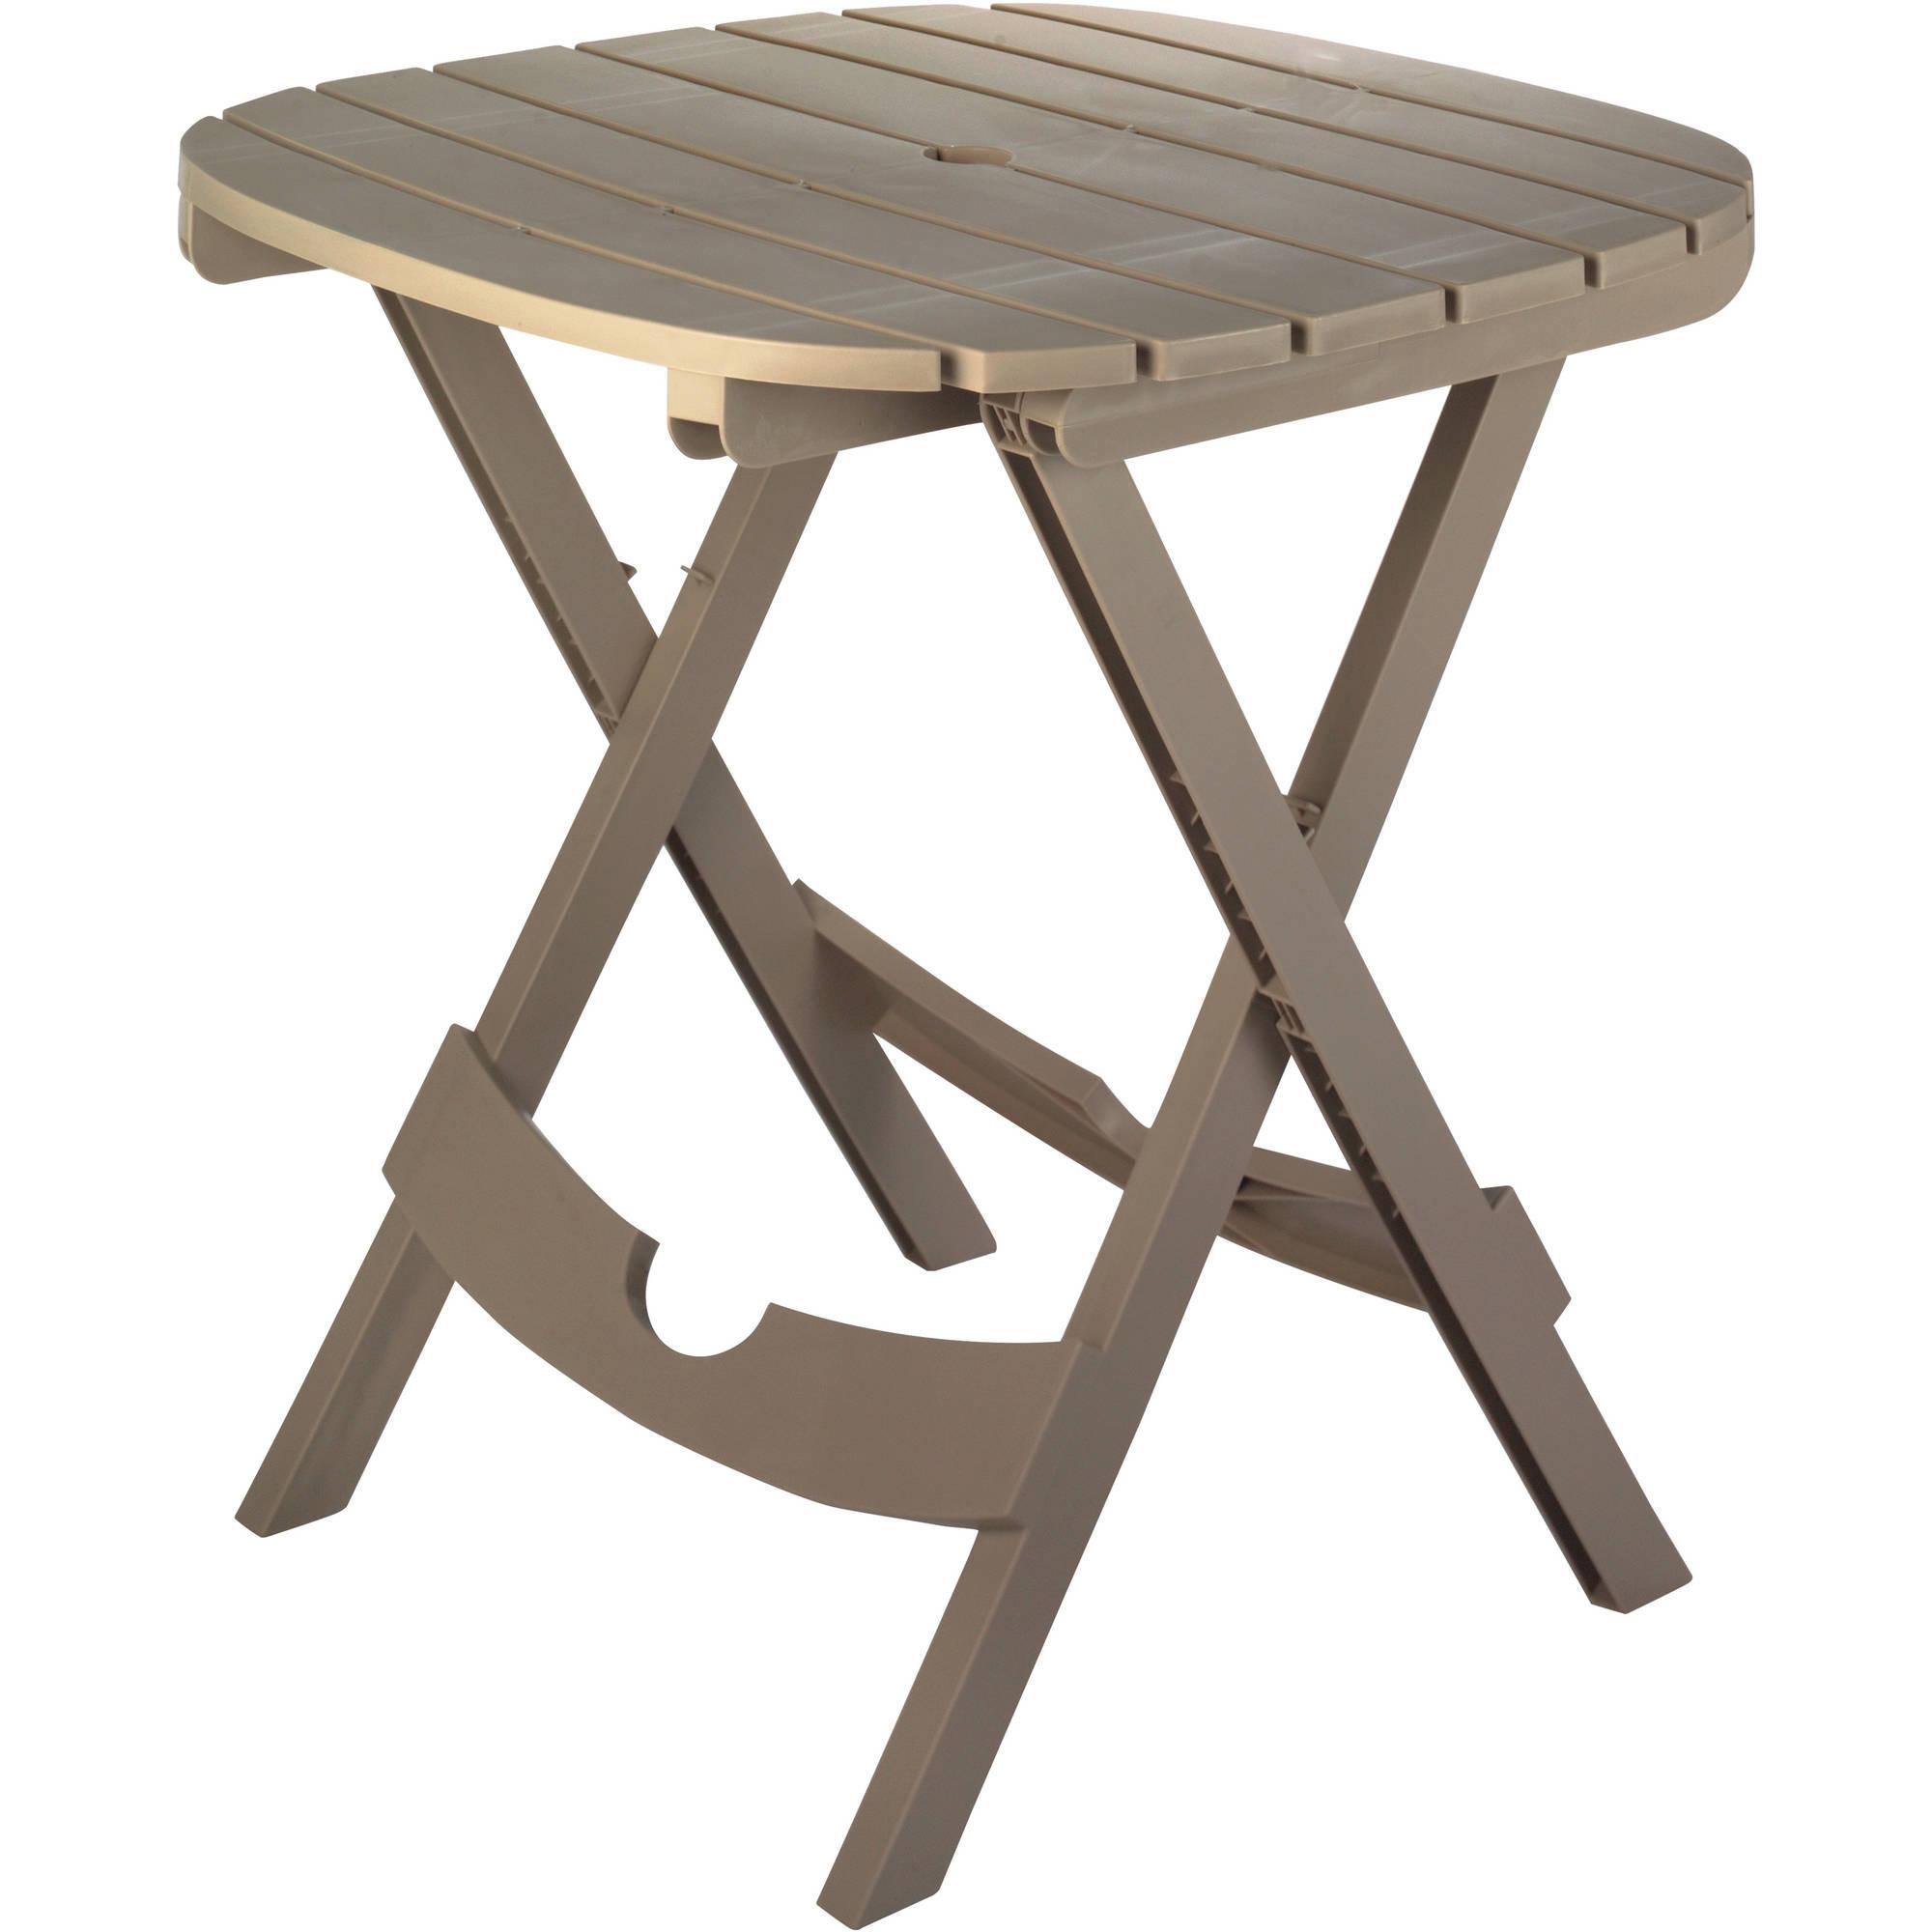 Image of Adams Manufacturing Resin Quik-Fold Cafe Table, Portobello